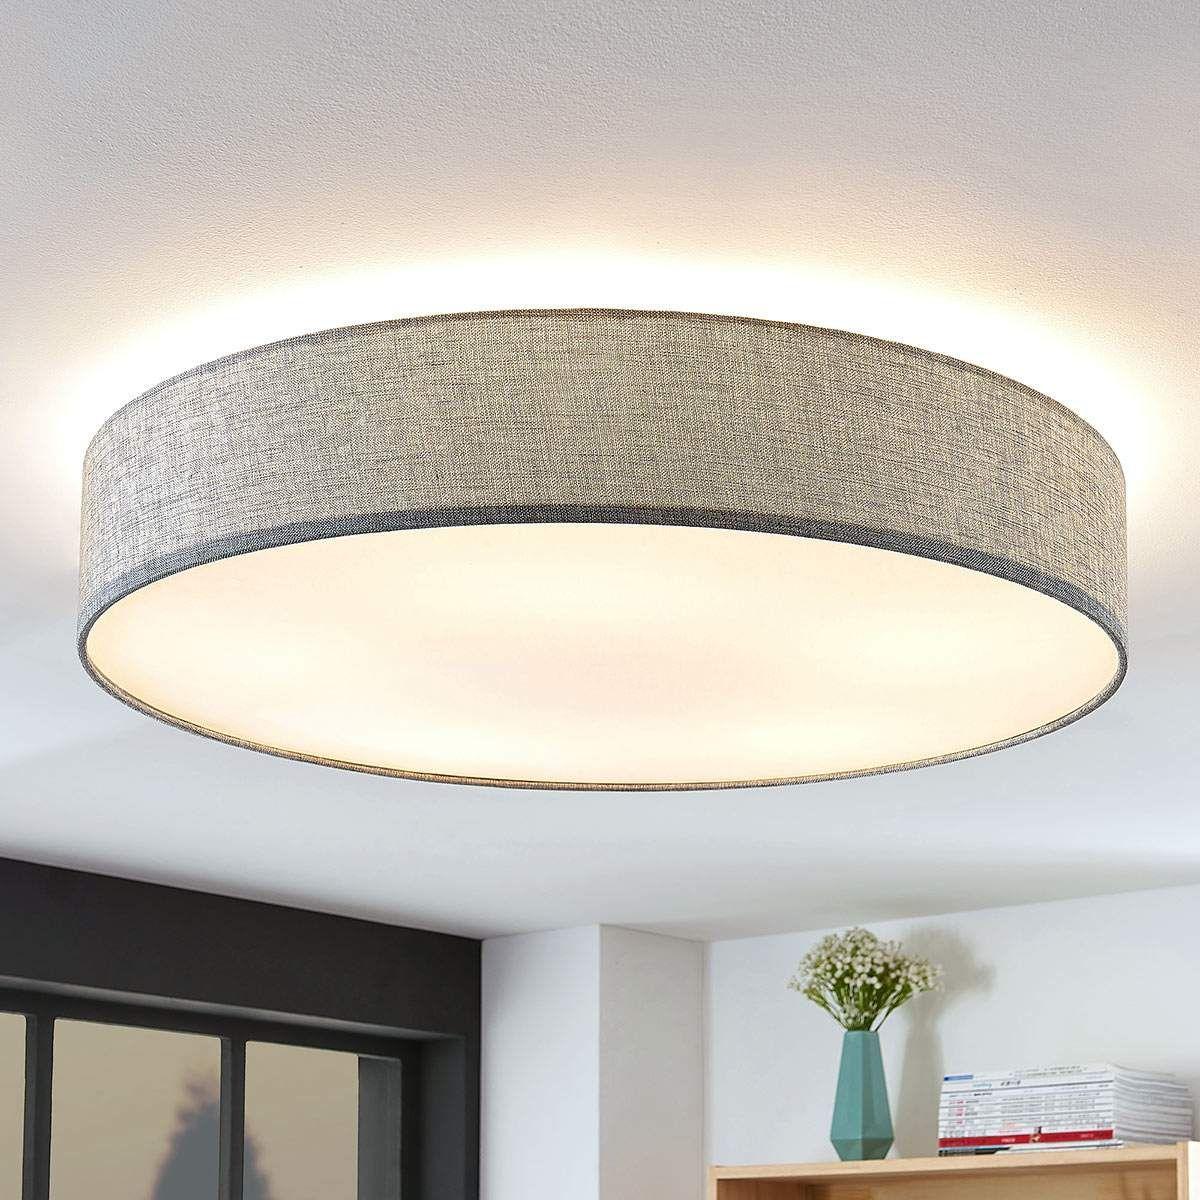 Stoff-Deckenlampe Gordana in Grau  Deckenlampe, Lampe, Lampen